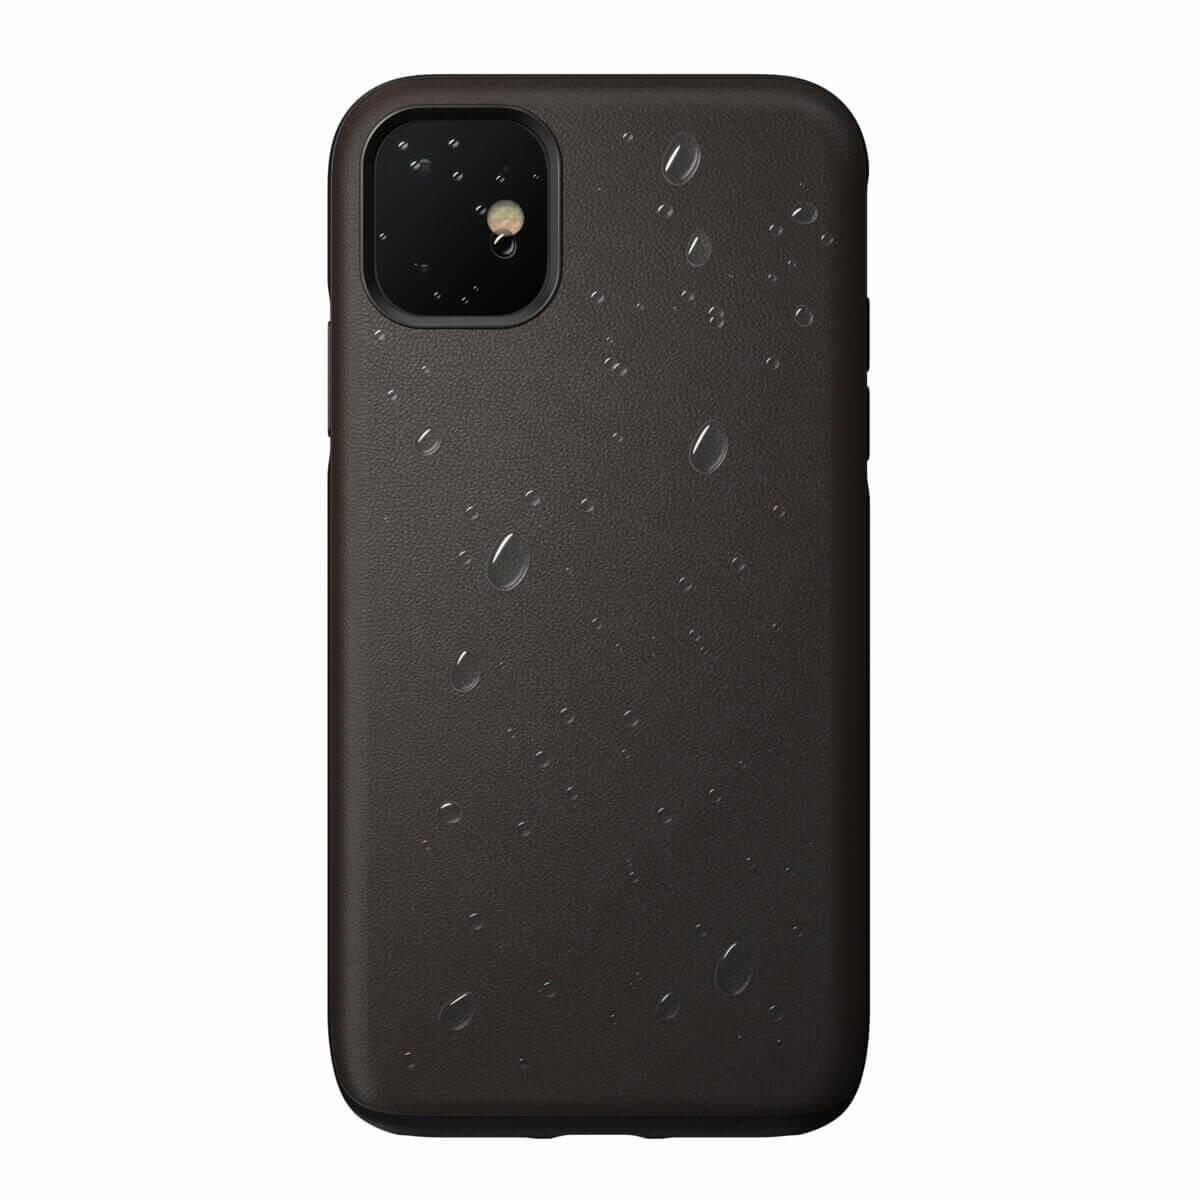 Nomad Leather Rugged Waterproof Case — кожен (естествена кожа) кейс за iPhone 11 (кафяв) - 5